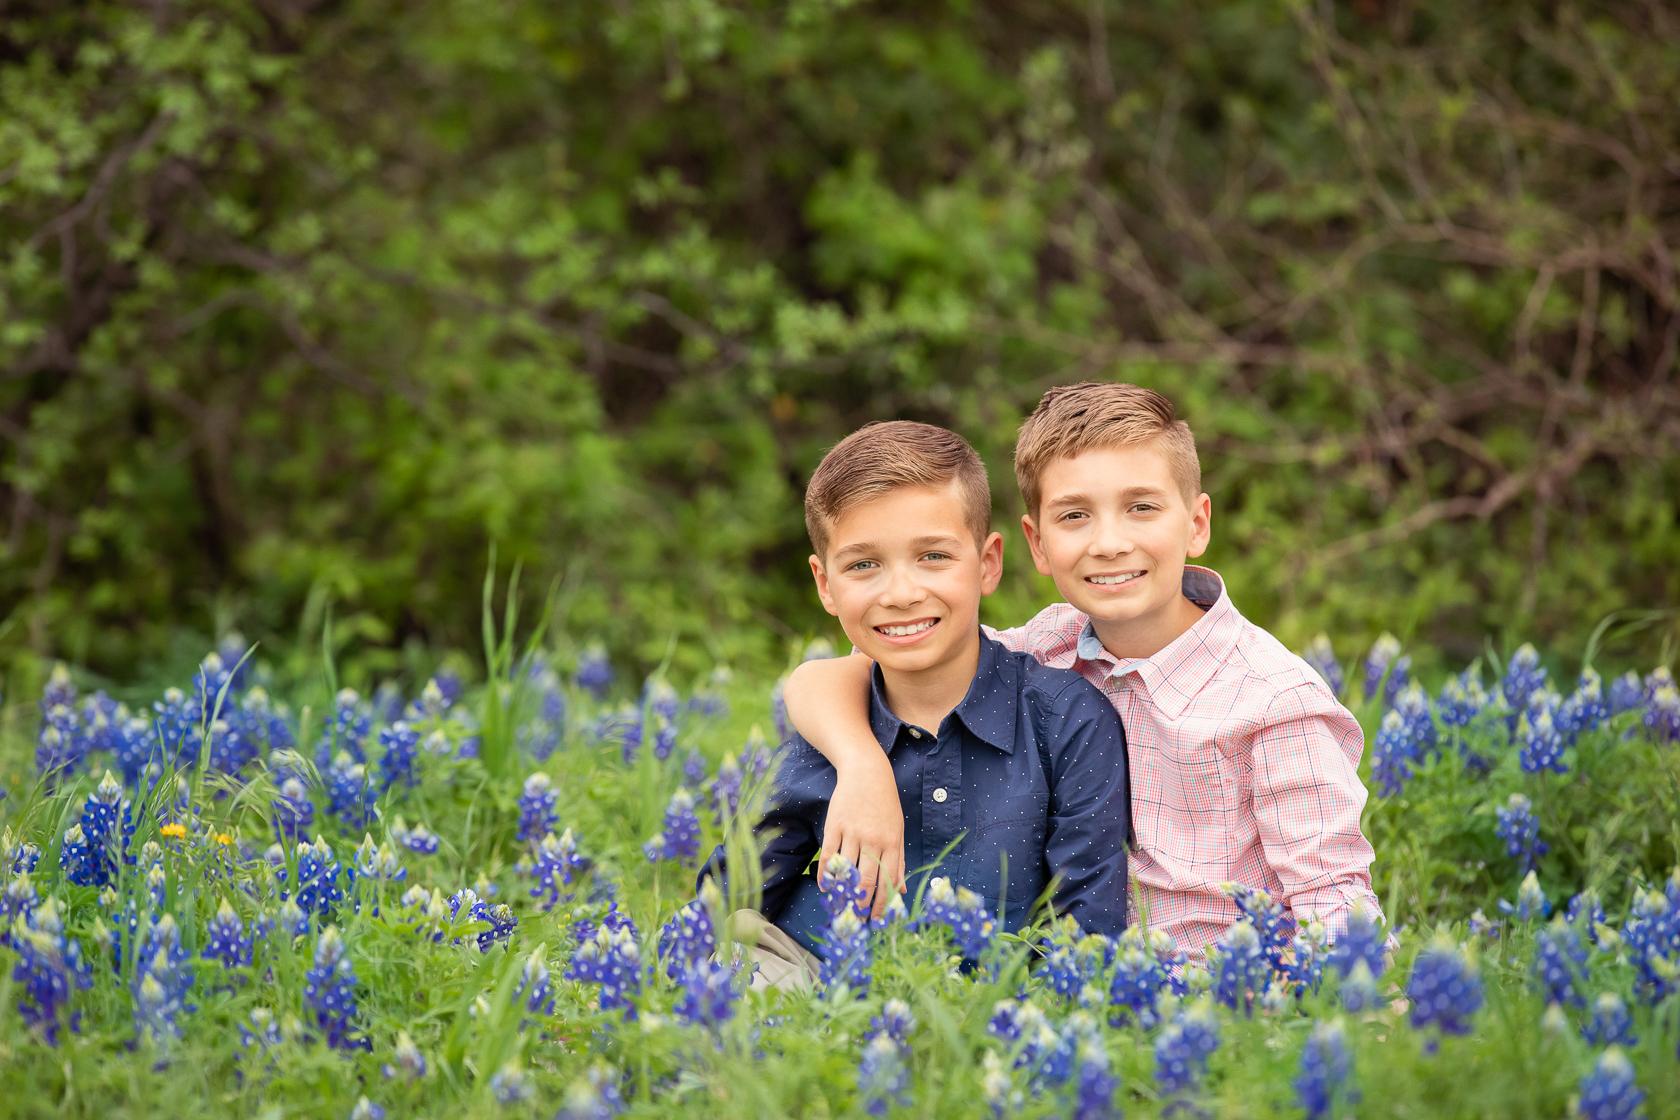 Dallas Children's Photographer